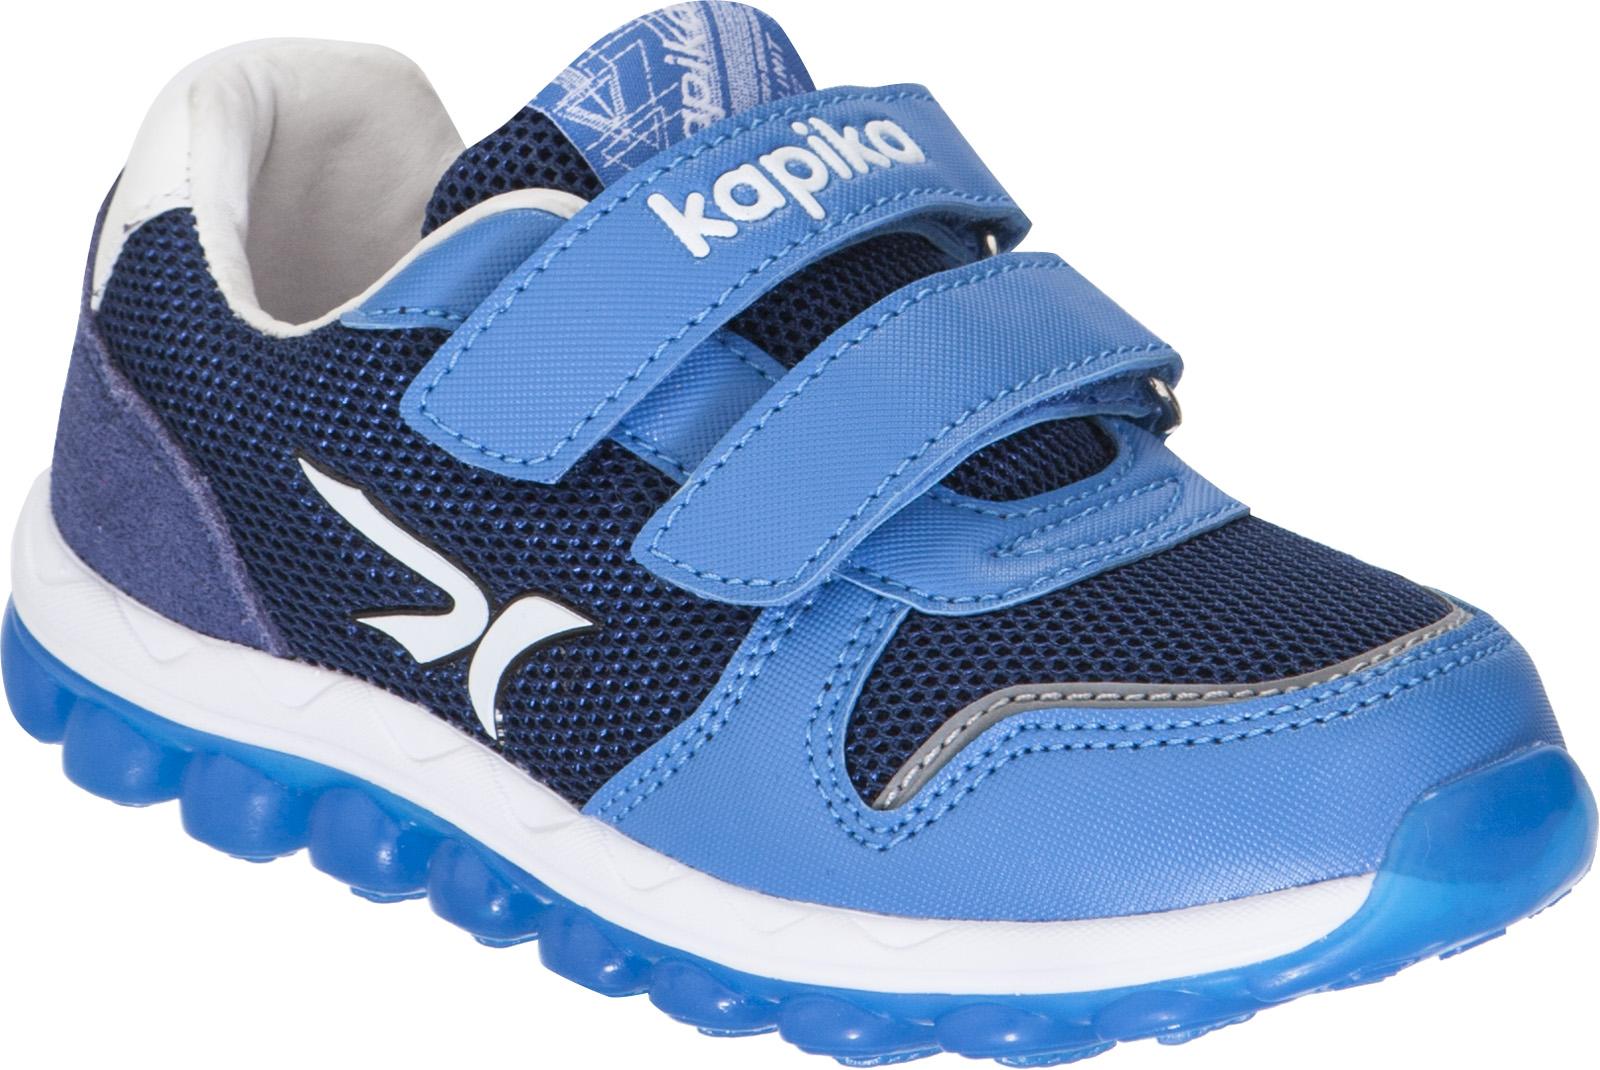 Кроссовки для мальчика Kapika, цвет: синий. 72272-1. Размер 3272272-1